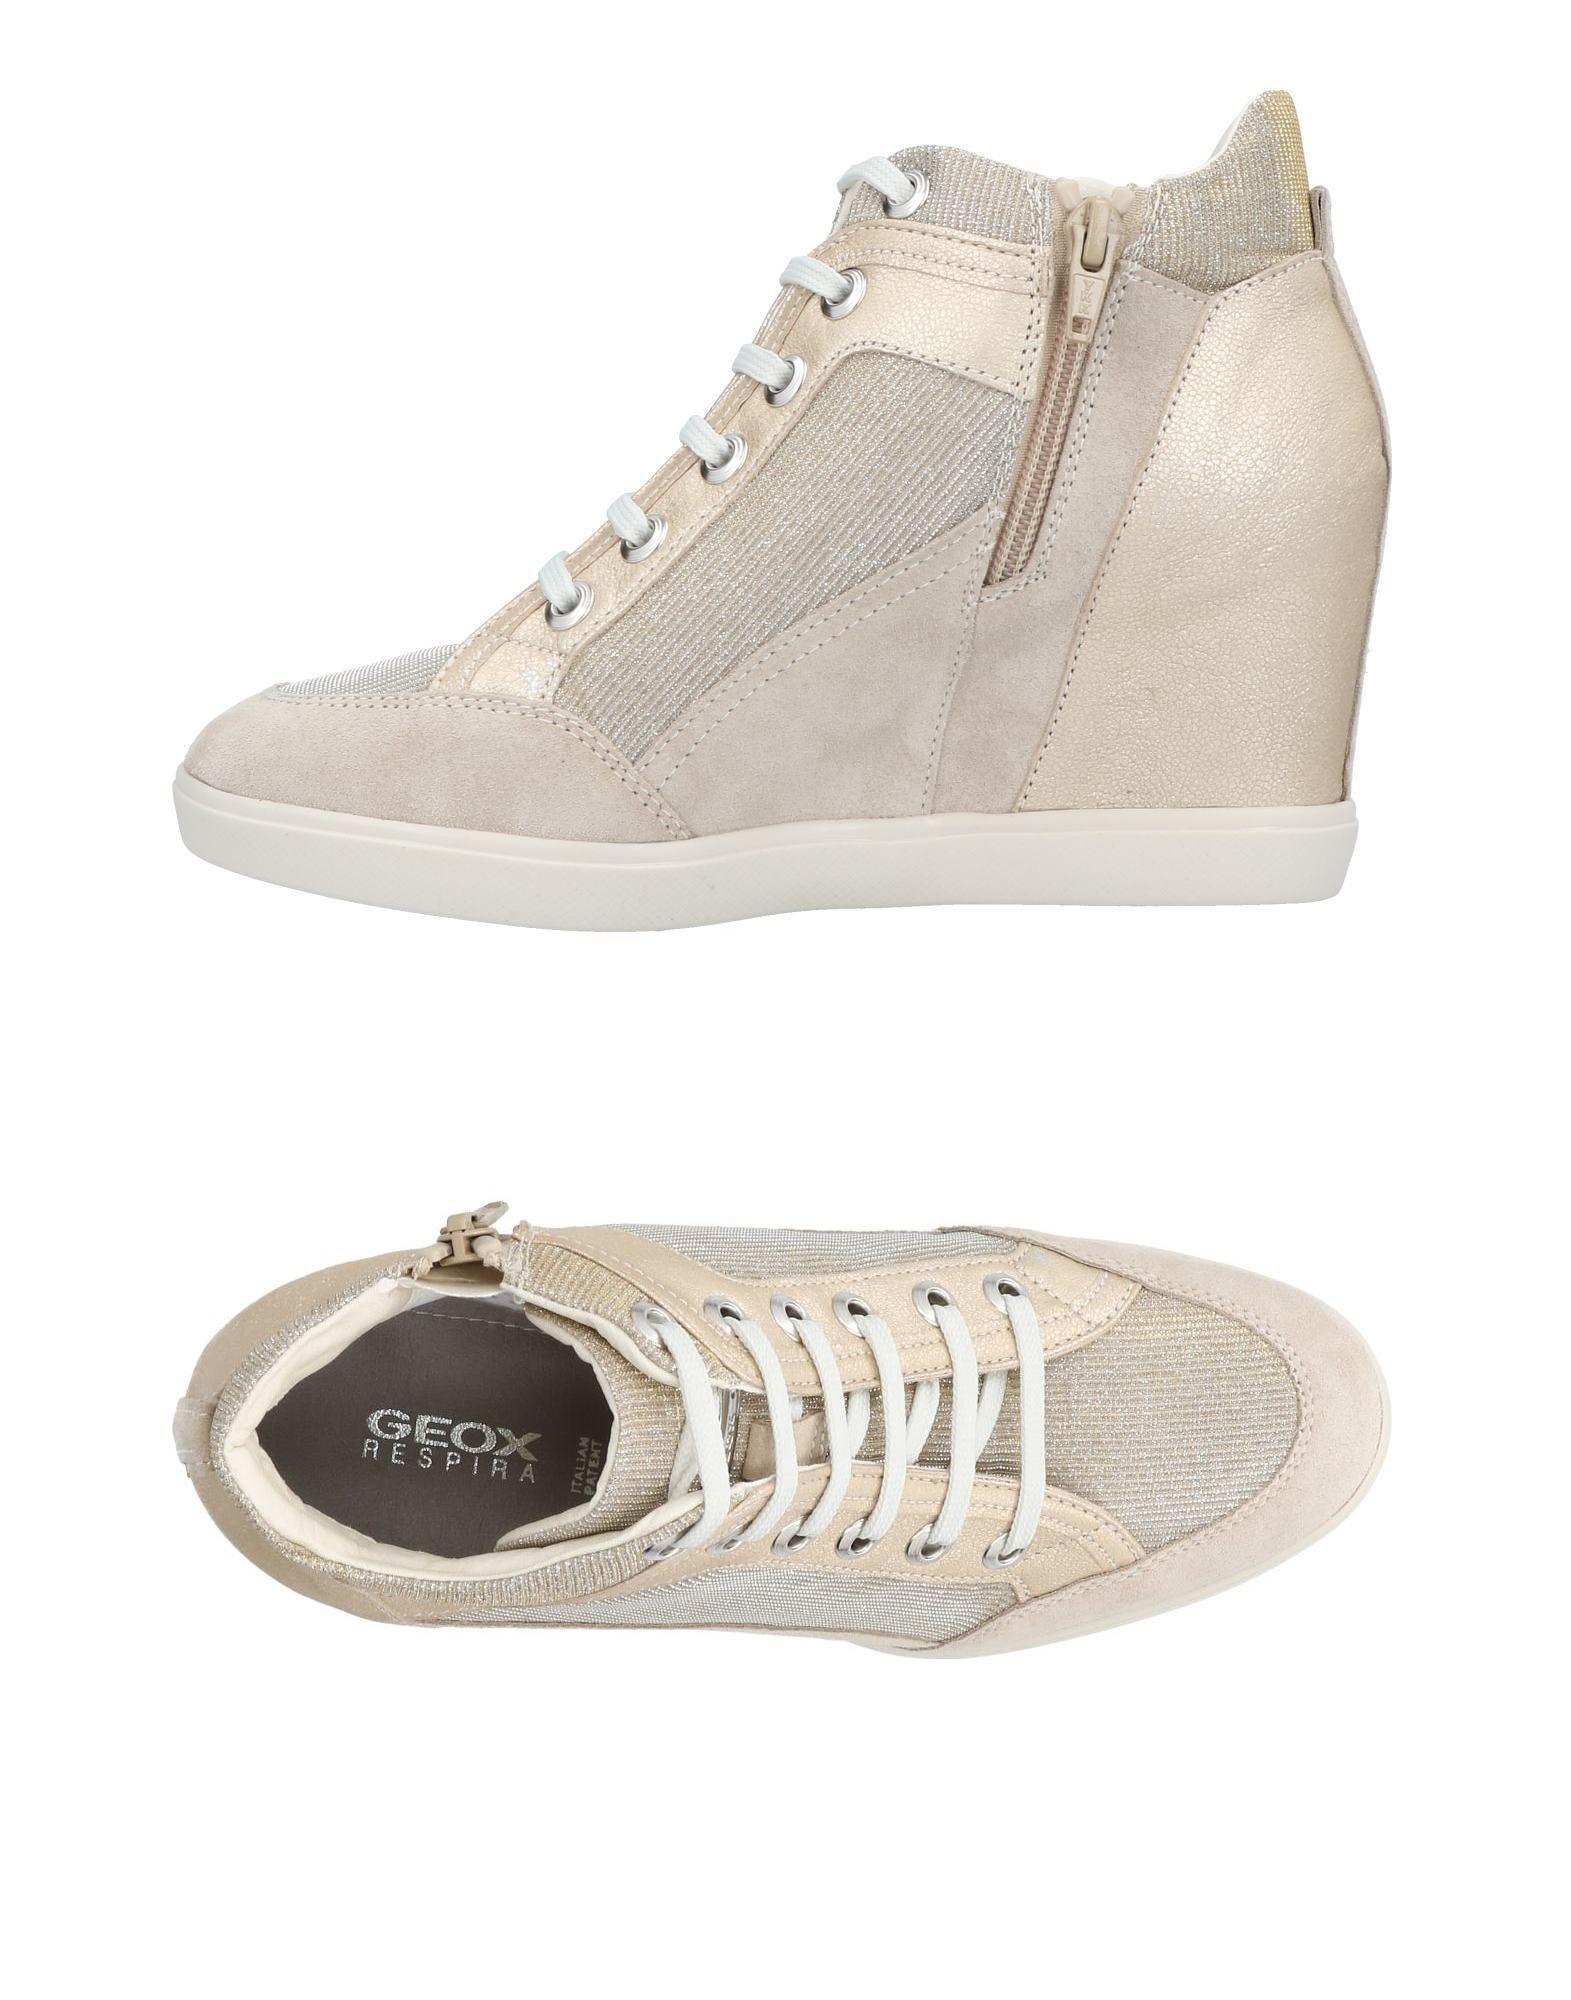 Stilvolle billige Schuhe Geox Sneakers Damen Damen Damen  11453875OT a30e81